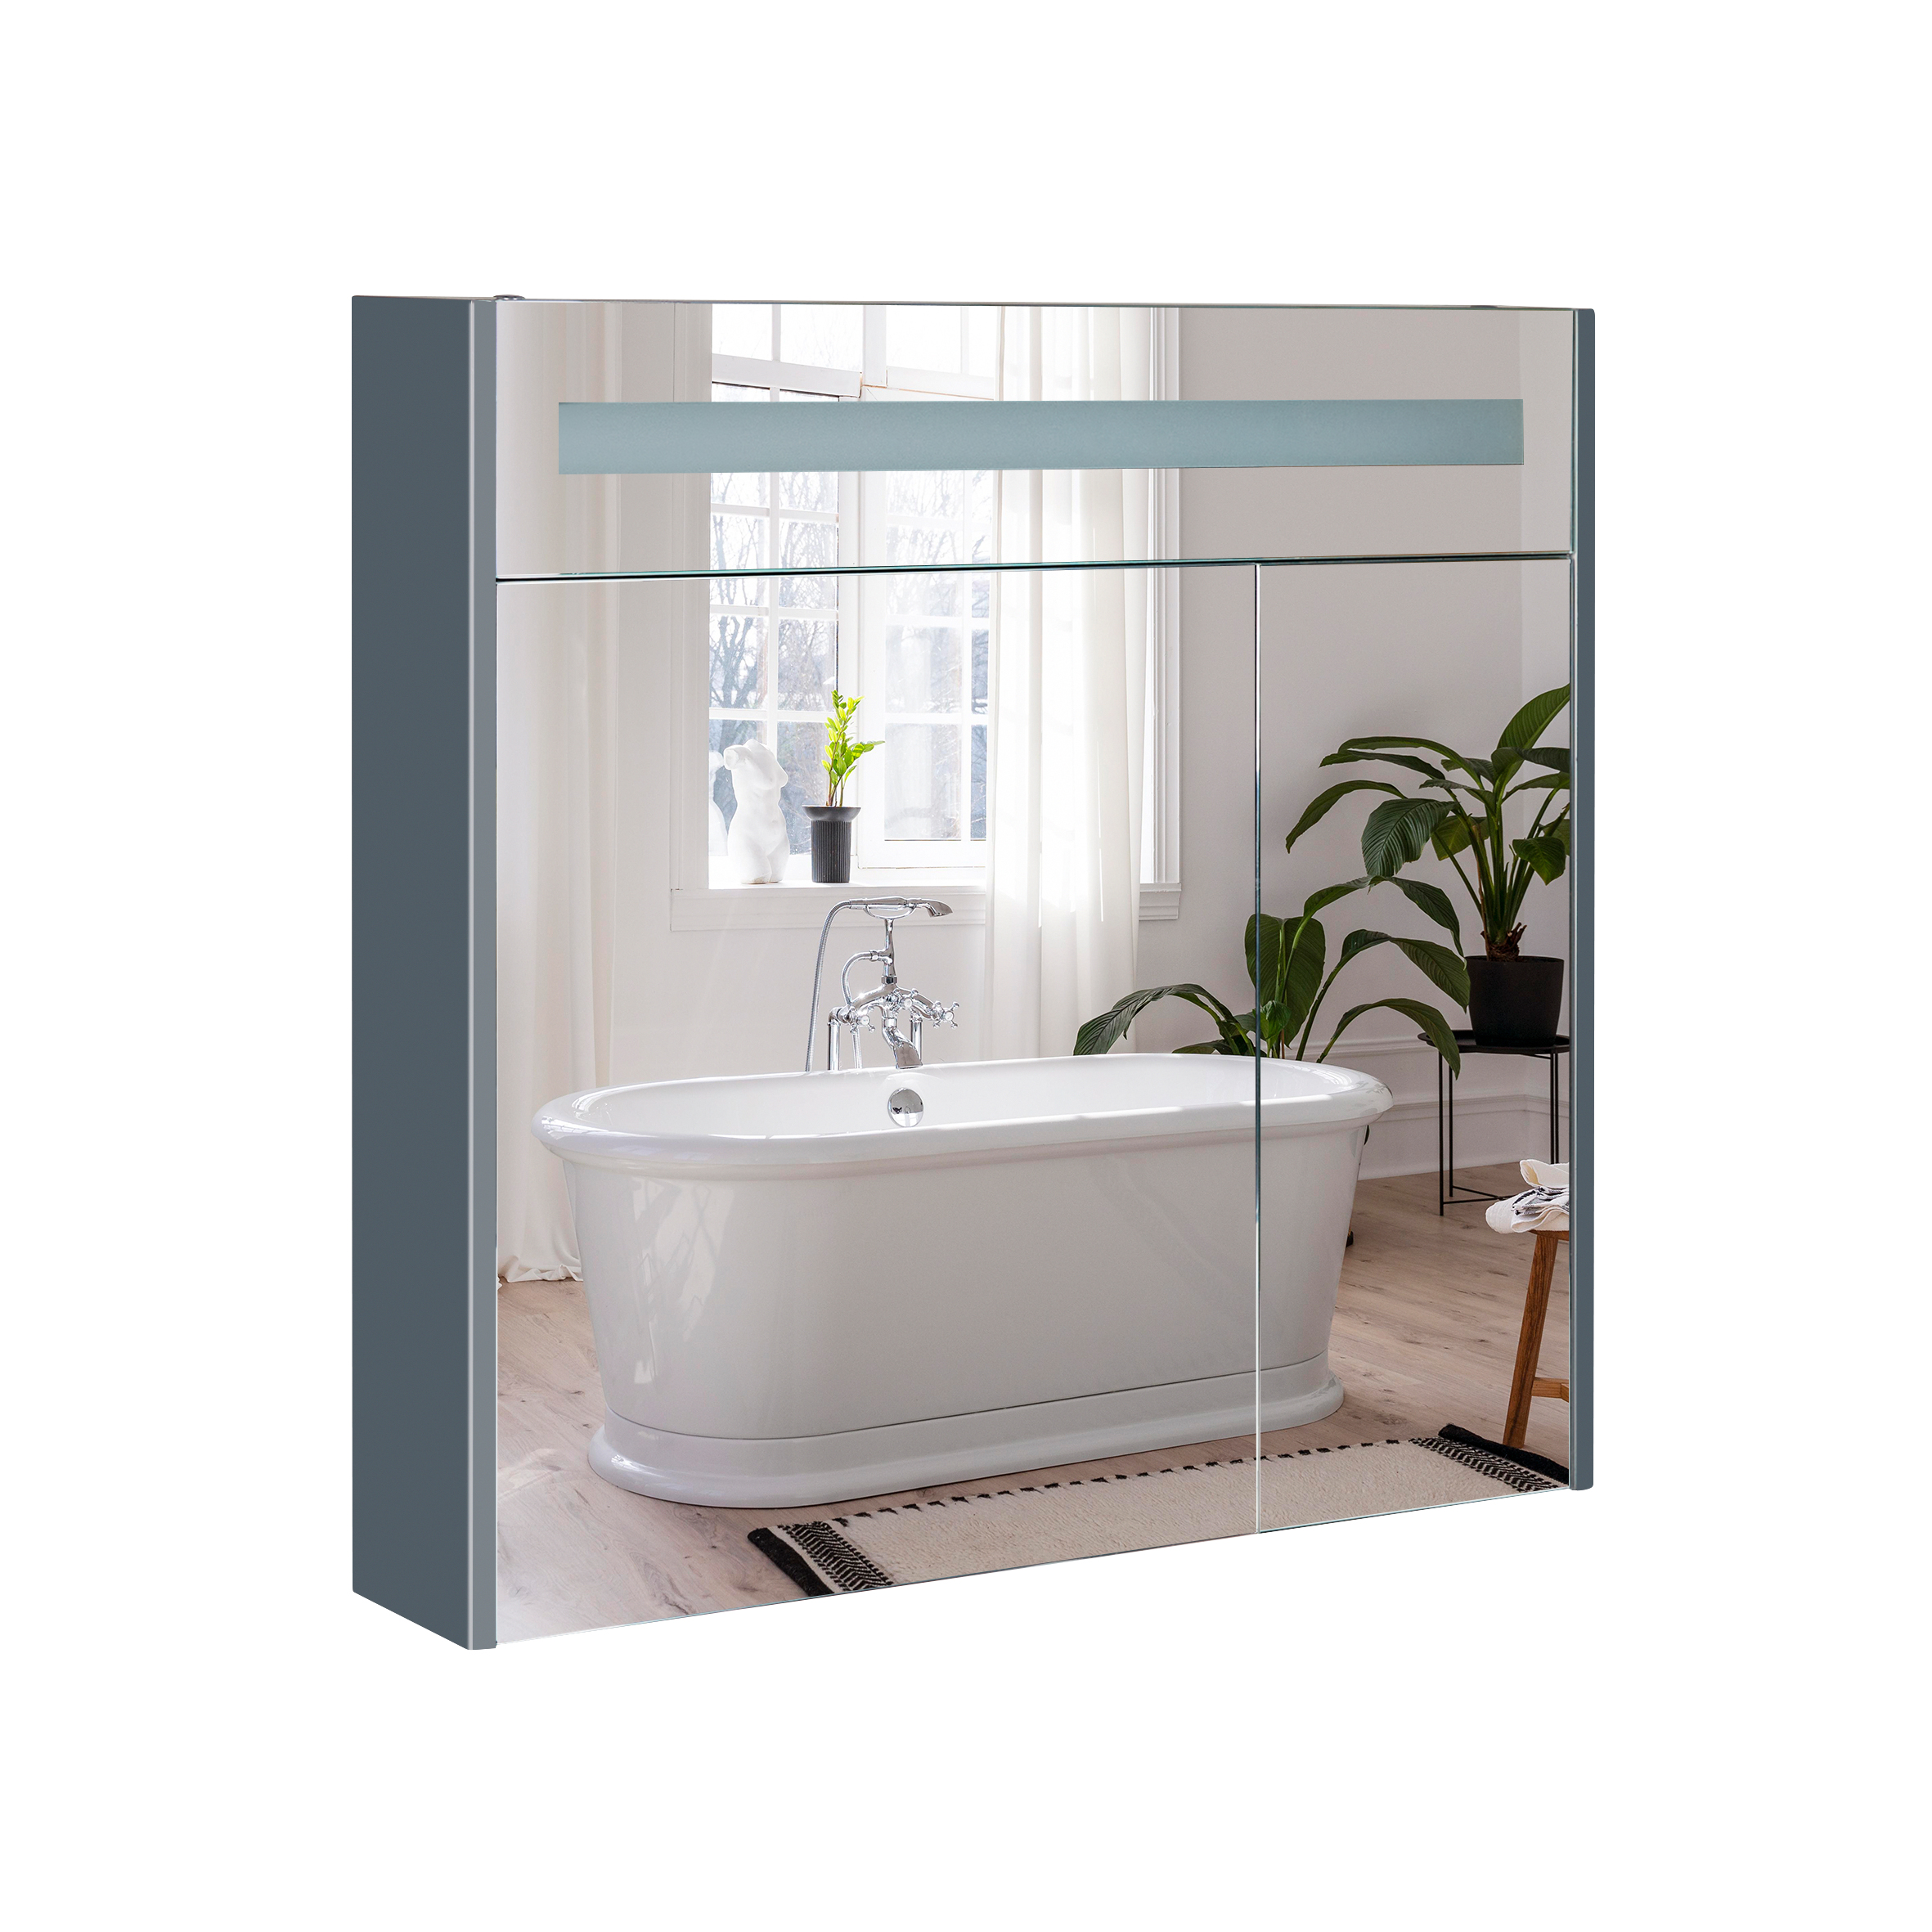 Зеркальный шкаф подвесной Qtap 800х730х145 Robin Graphite с LED-подсветкой QT1377ZP8002G